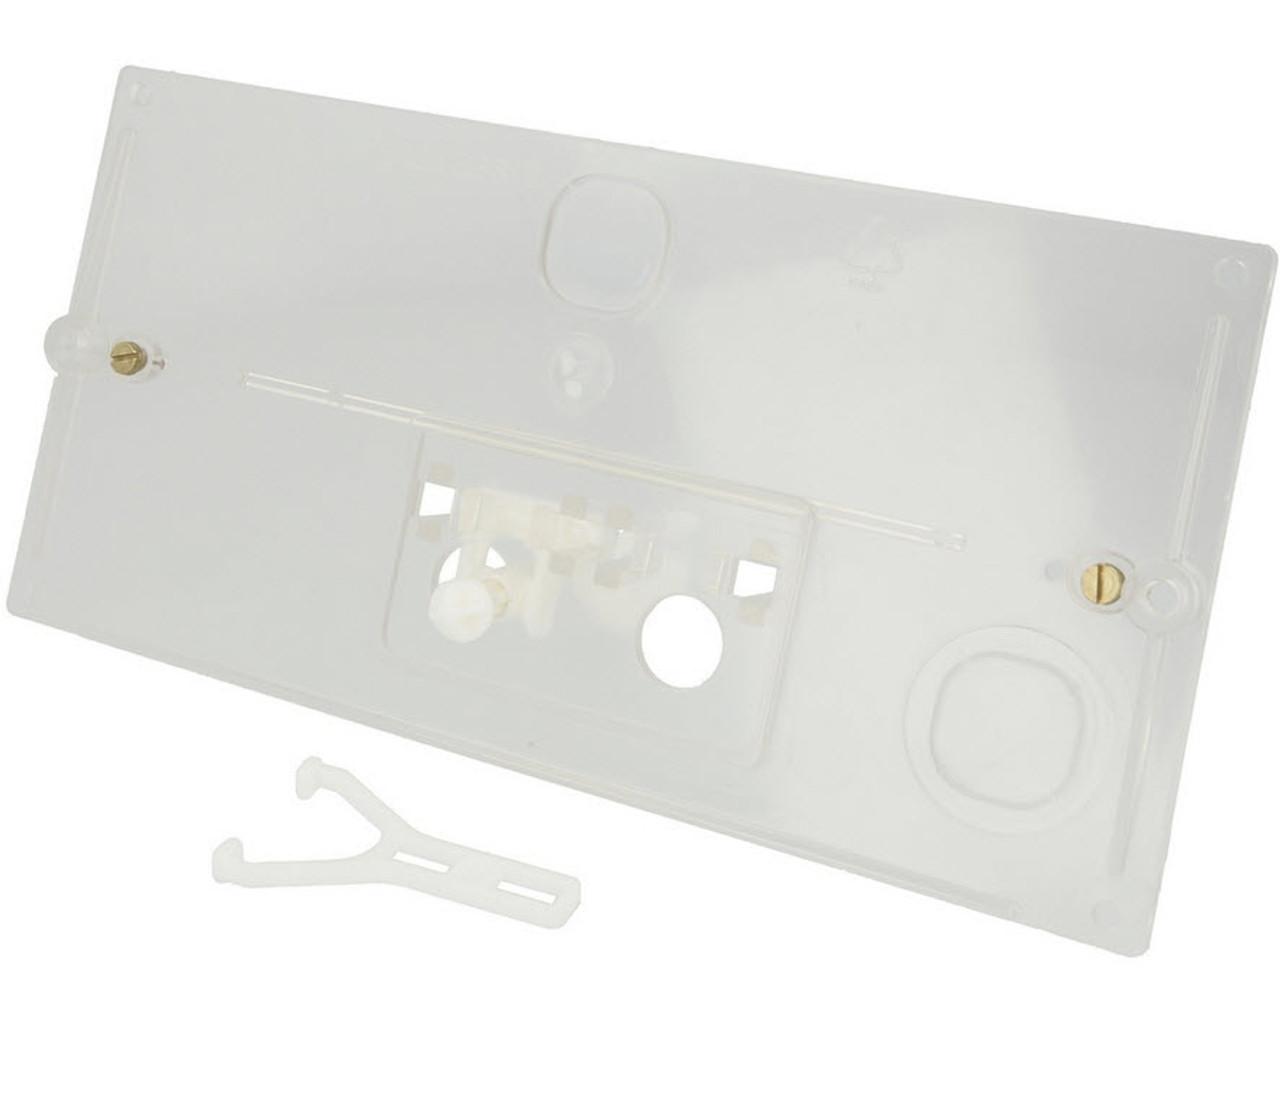 Geberit protective plate transparent 240.026.00.1